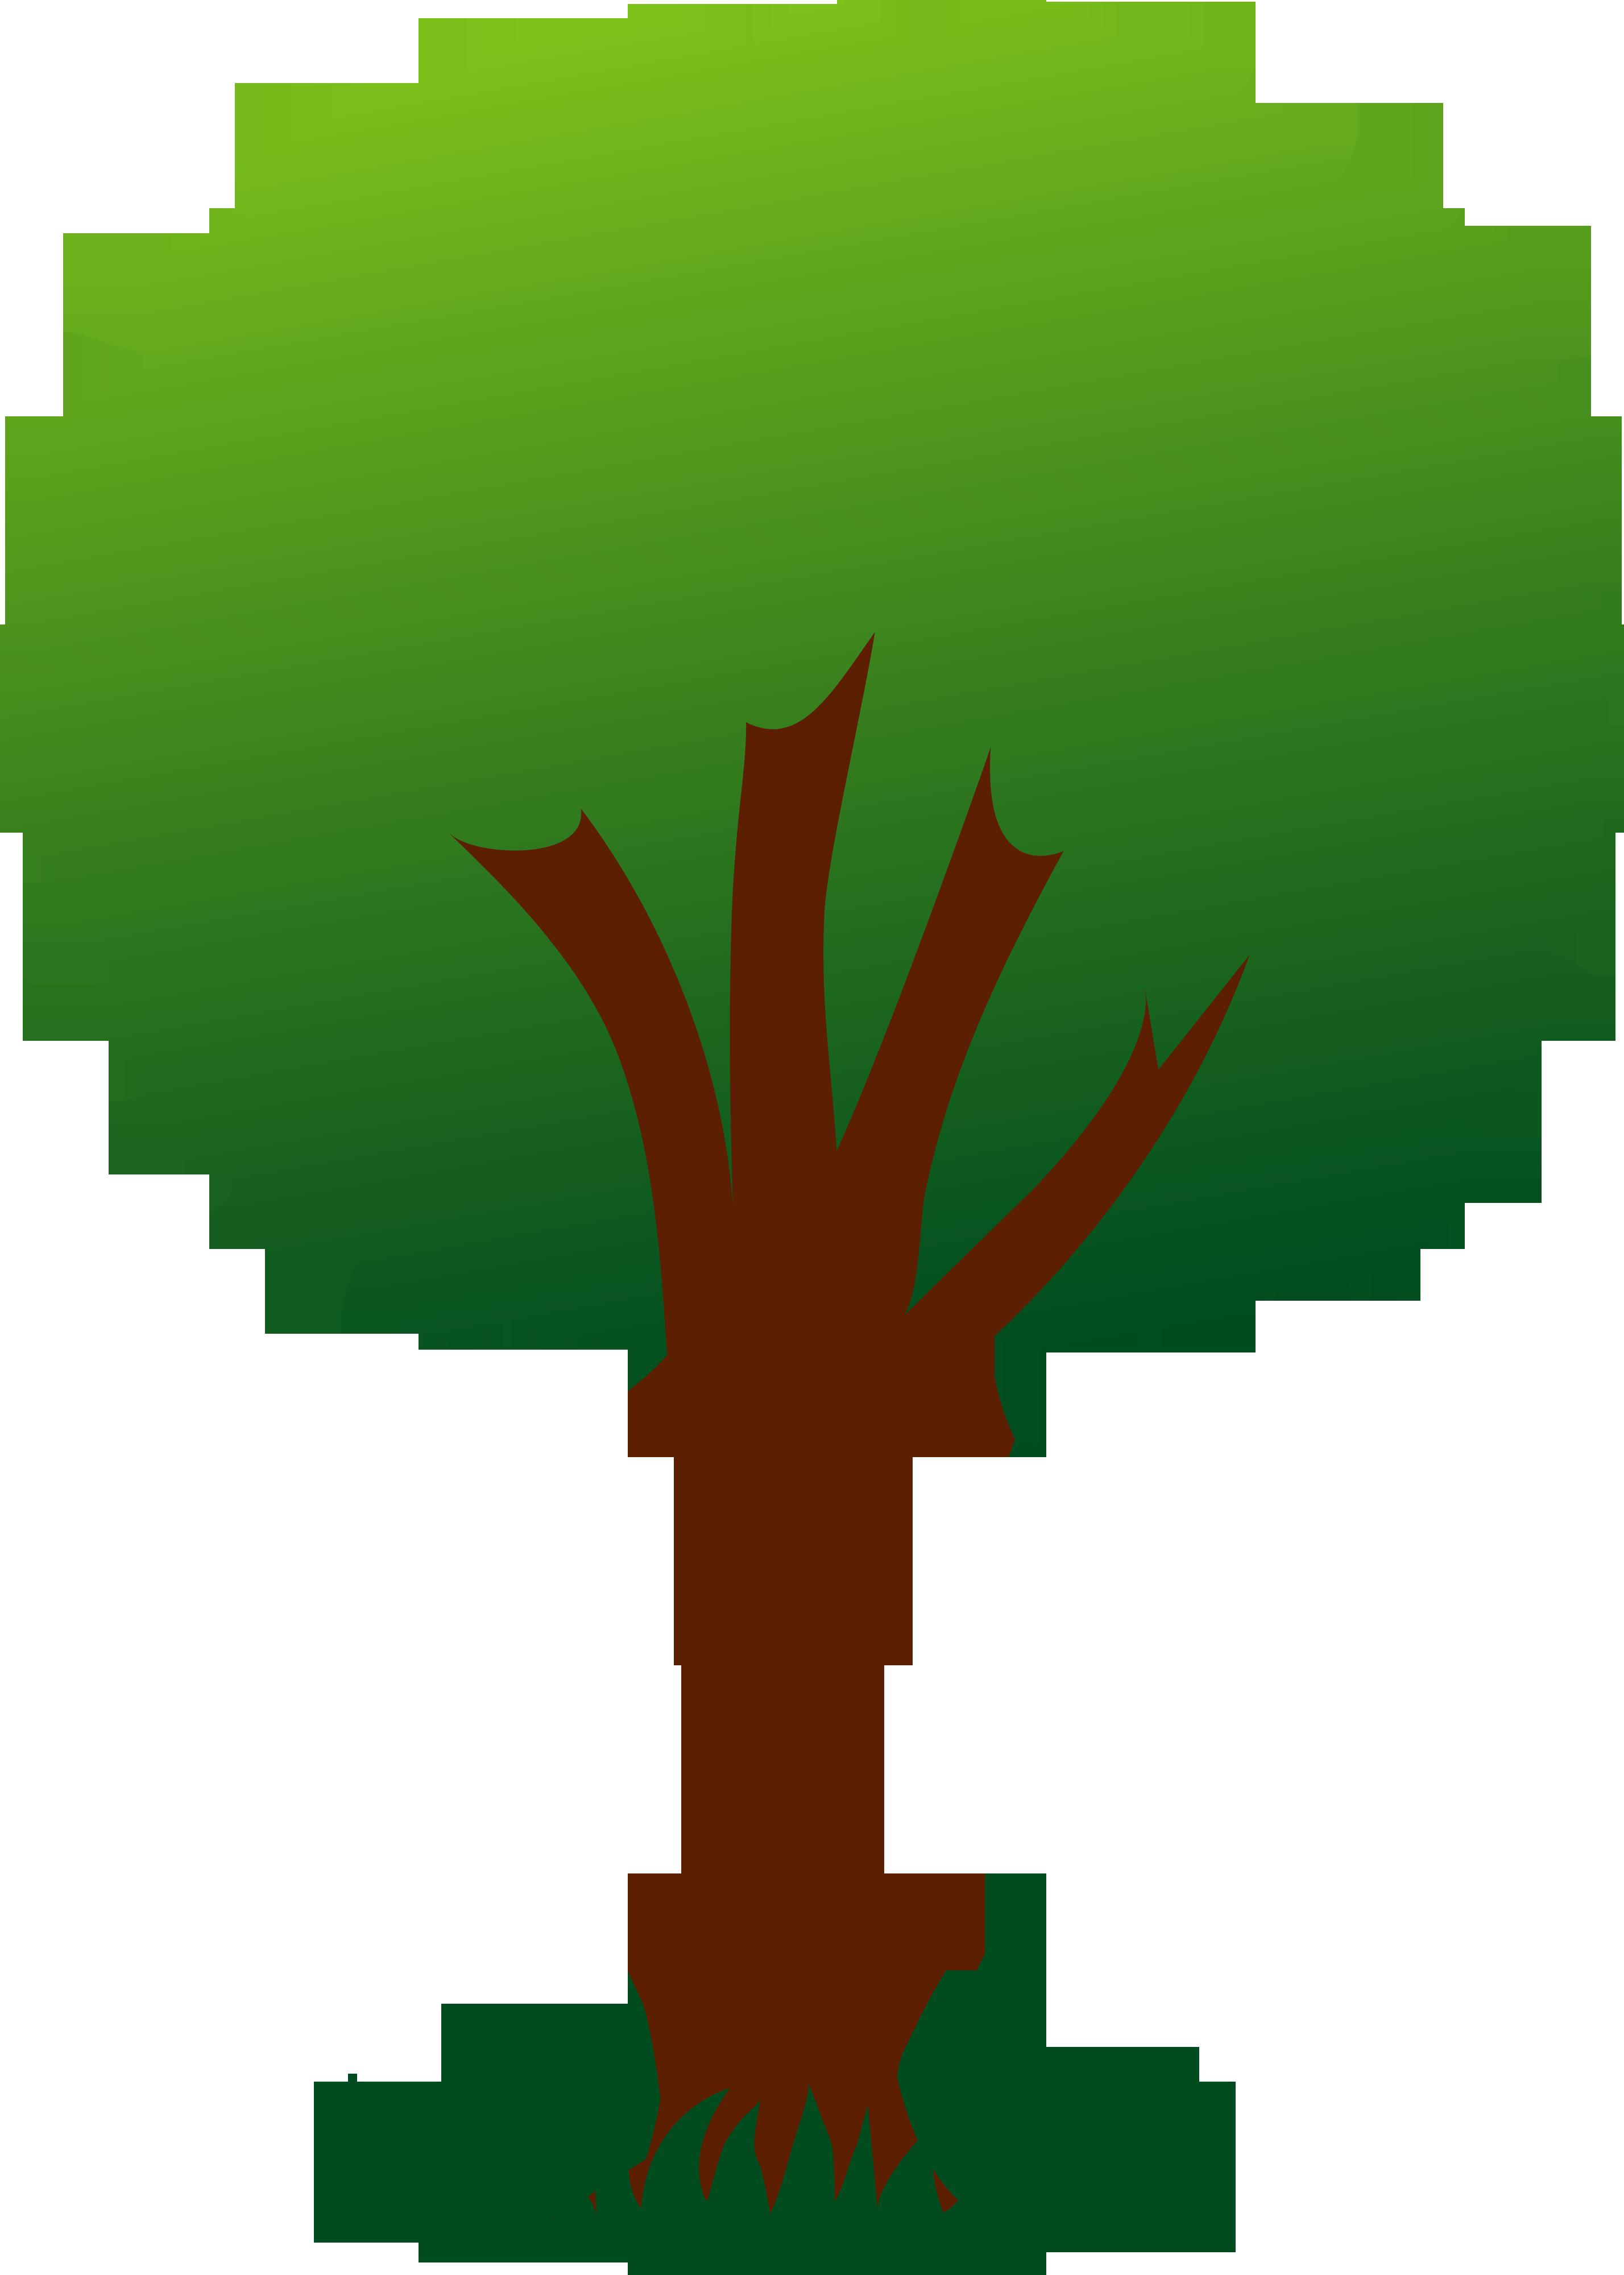 Free green tree.